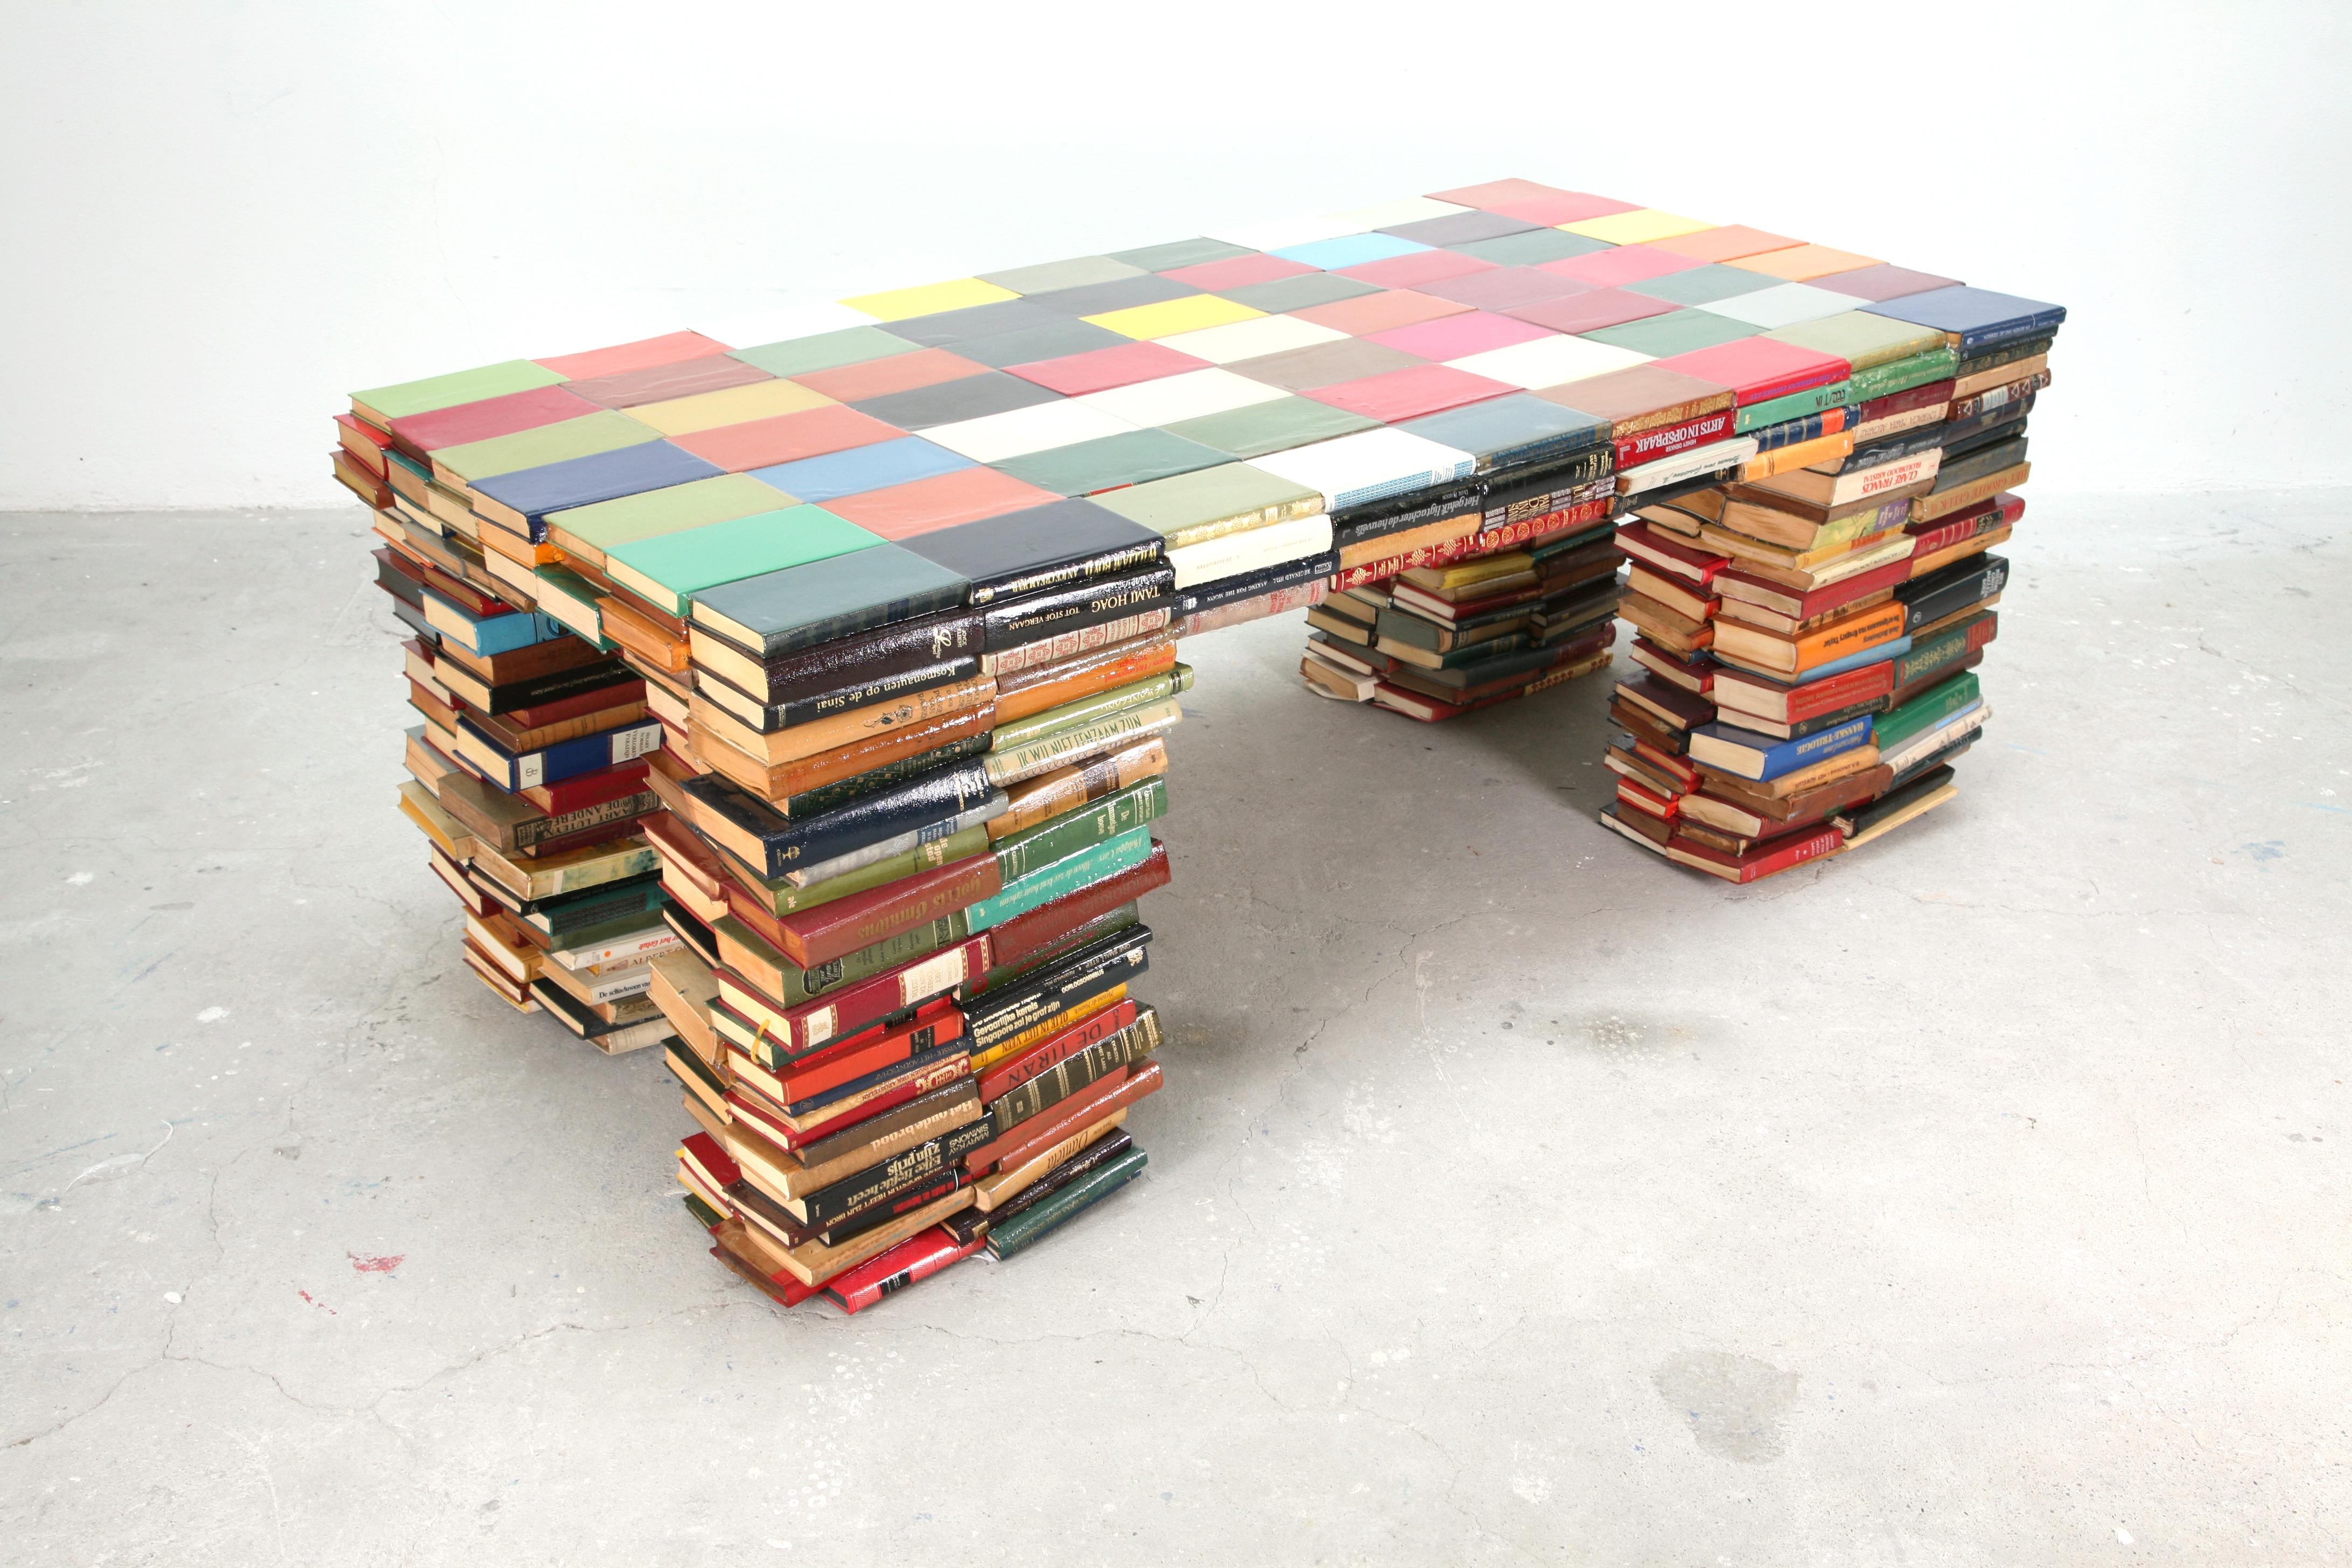 2012-03-07-richard-hutten-layers-interieur-tafel-stijl-boekentafel